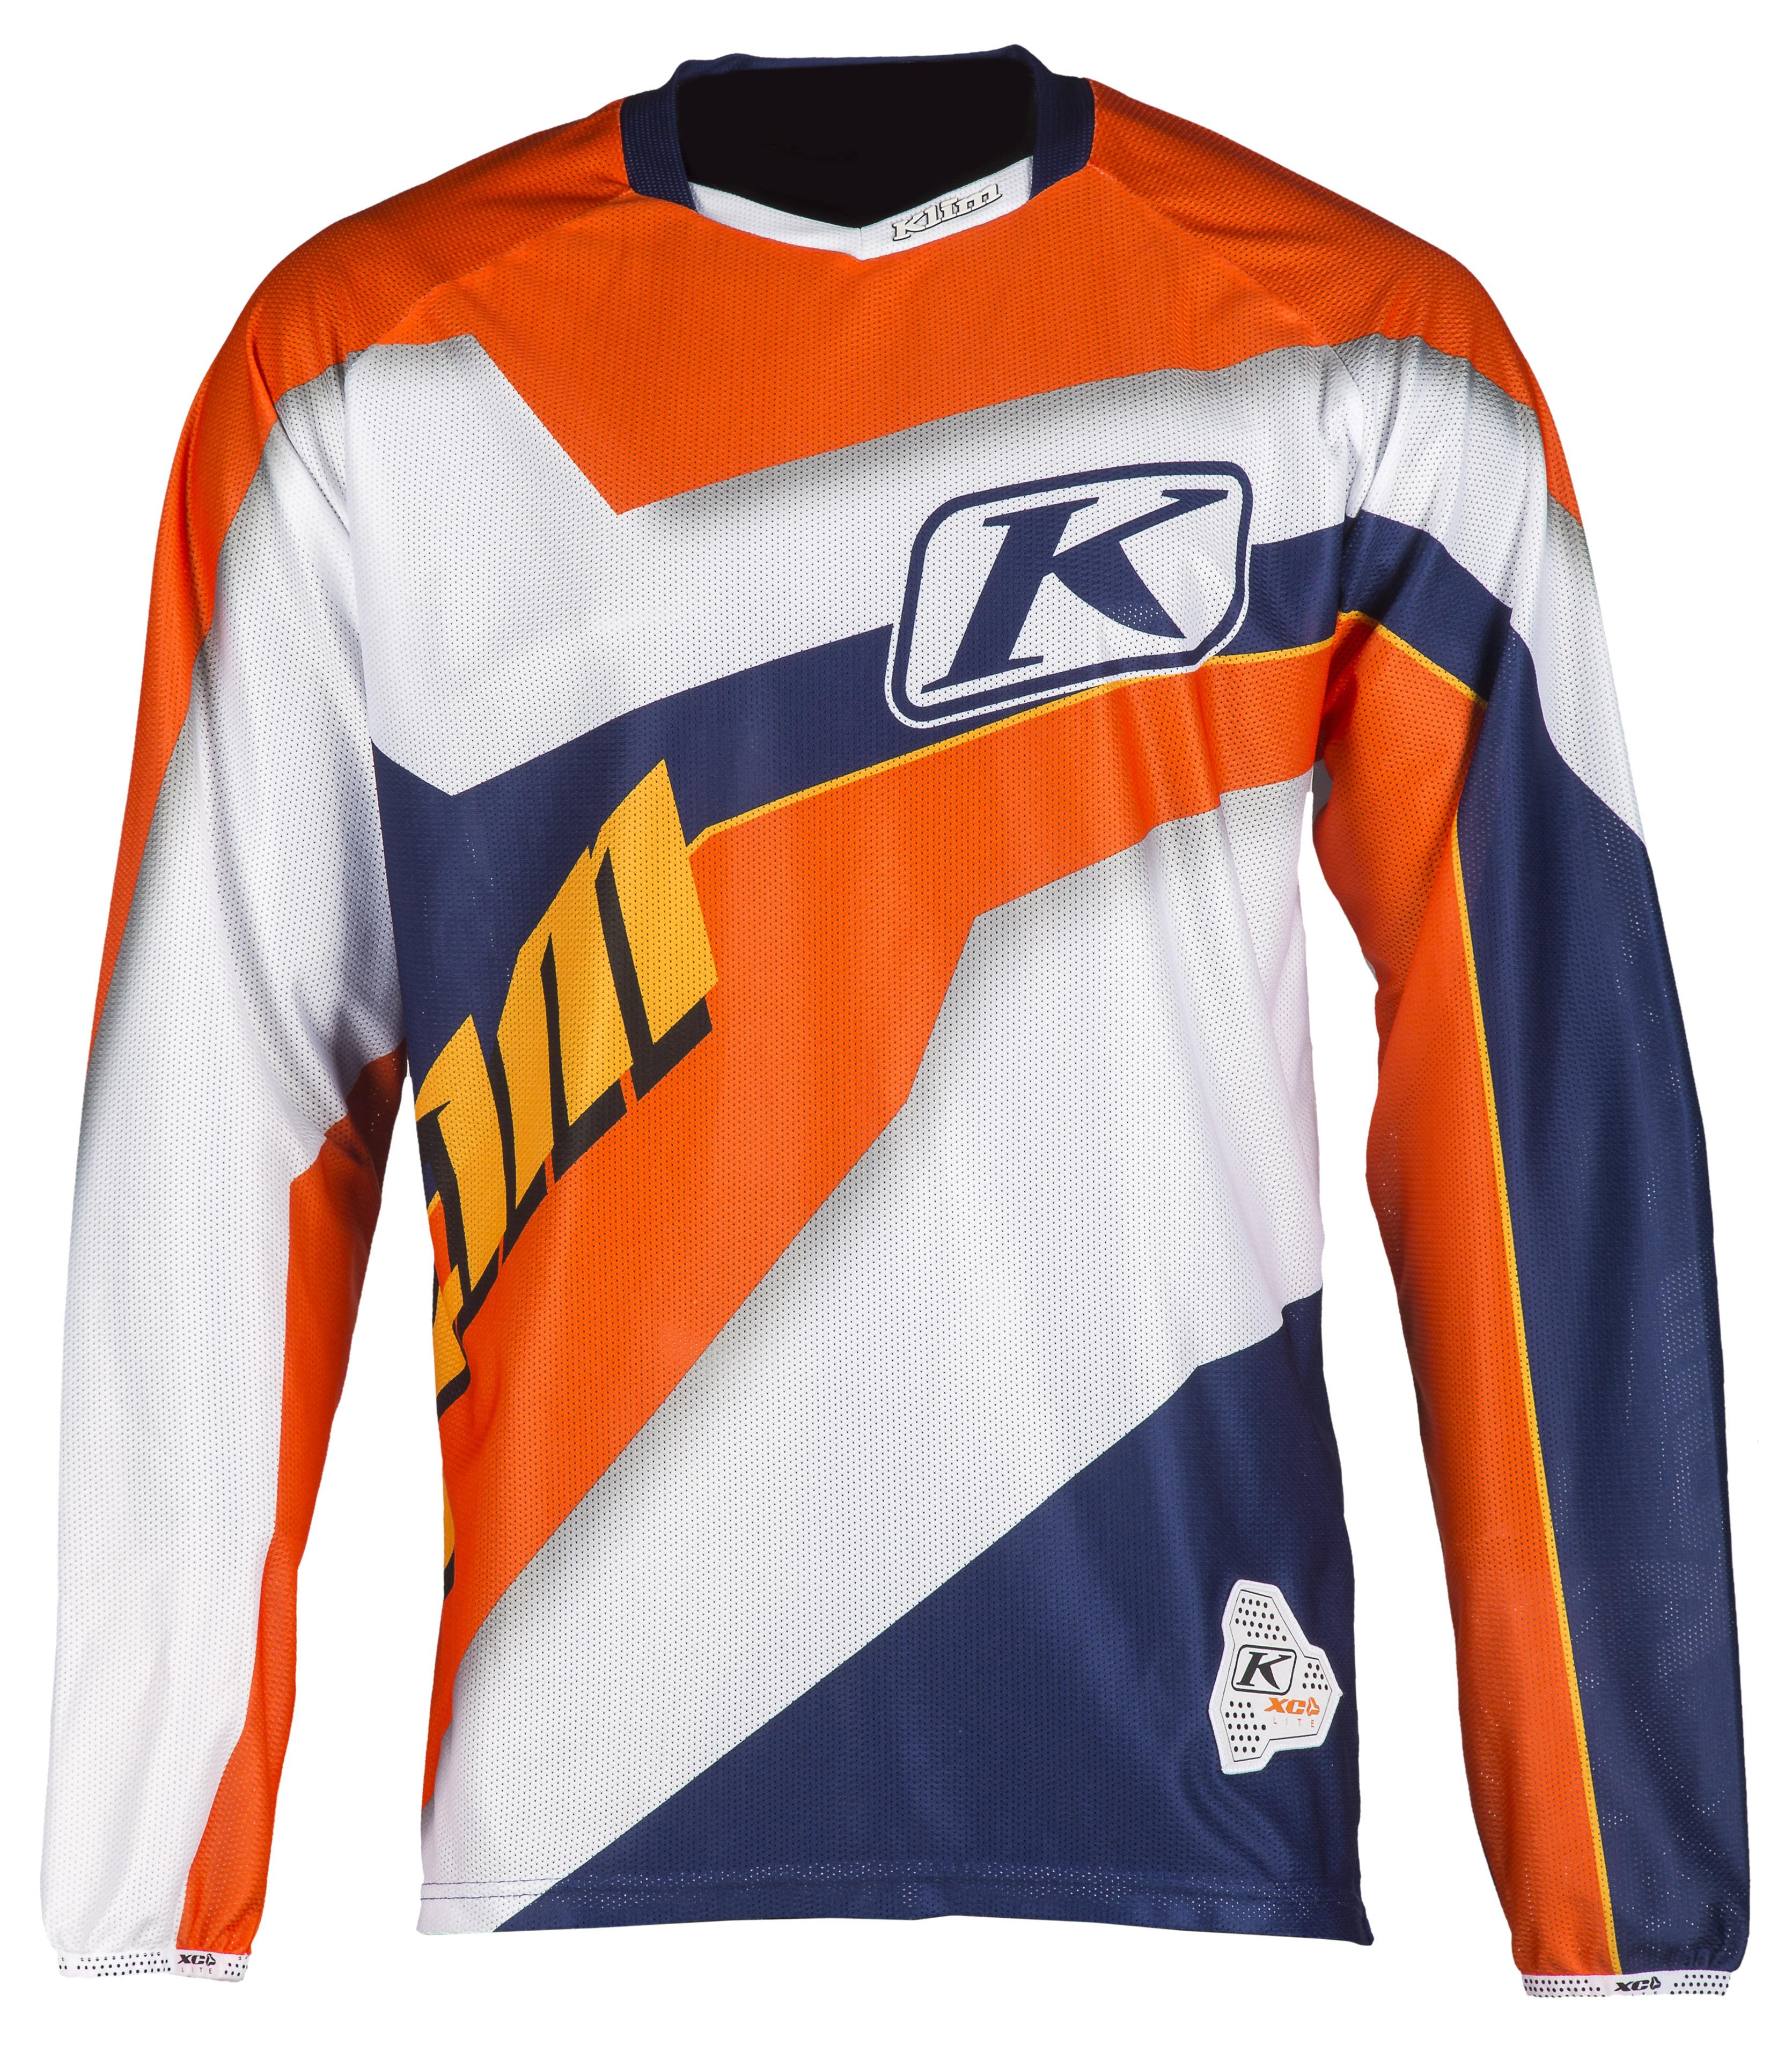 XC LITE Jersey 5003-002-400